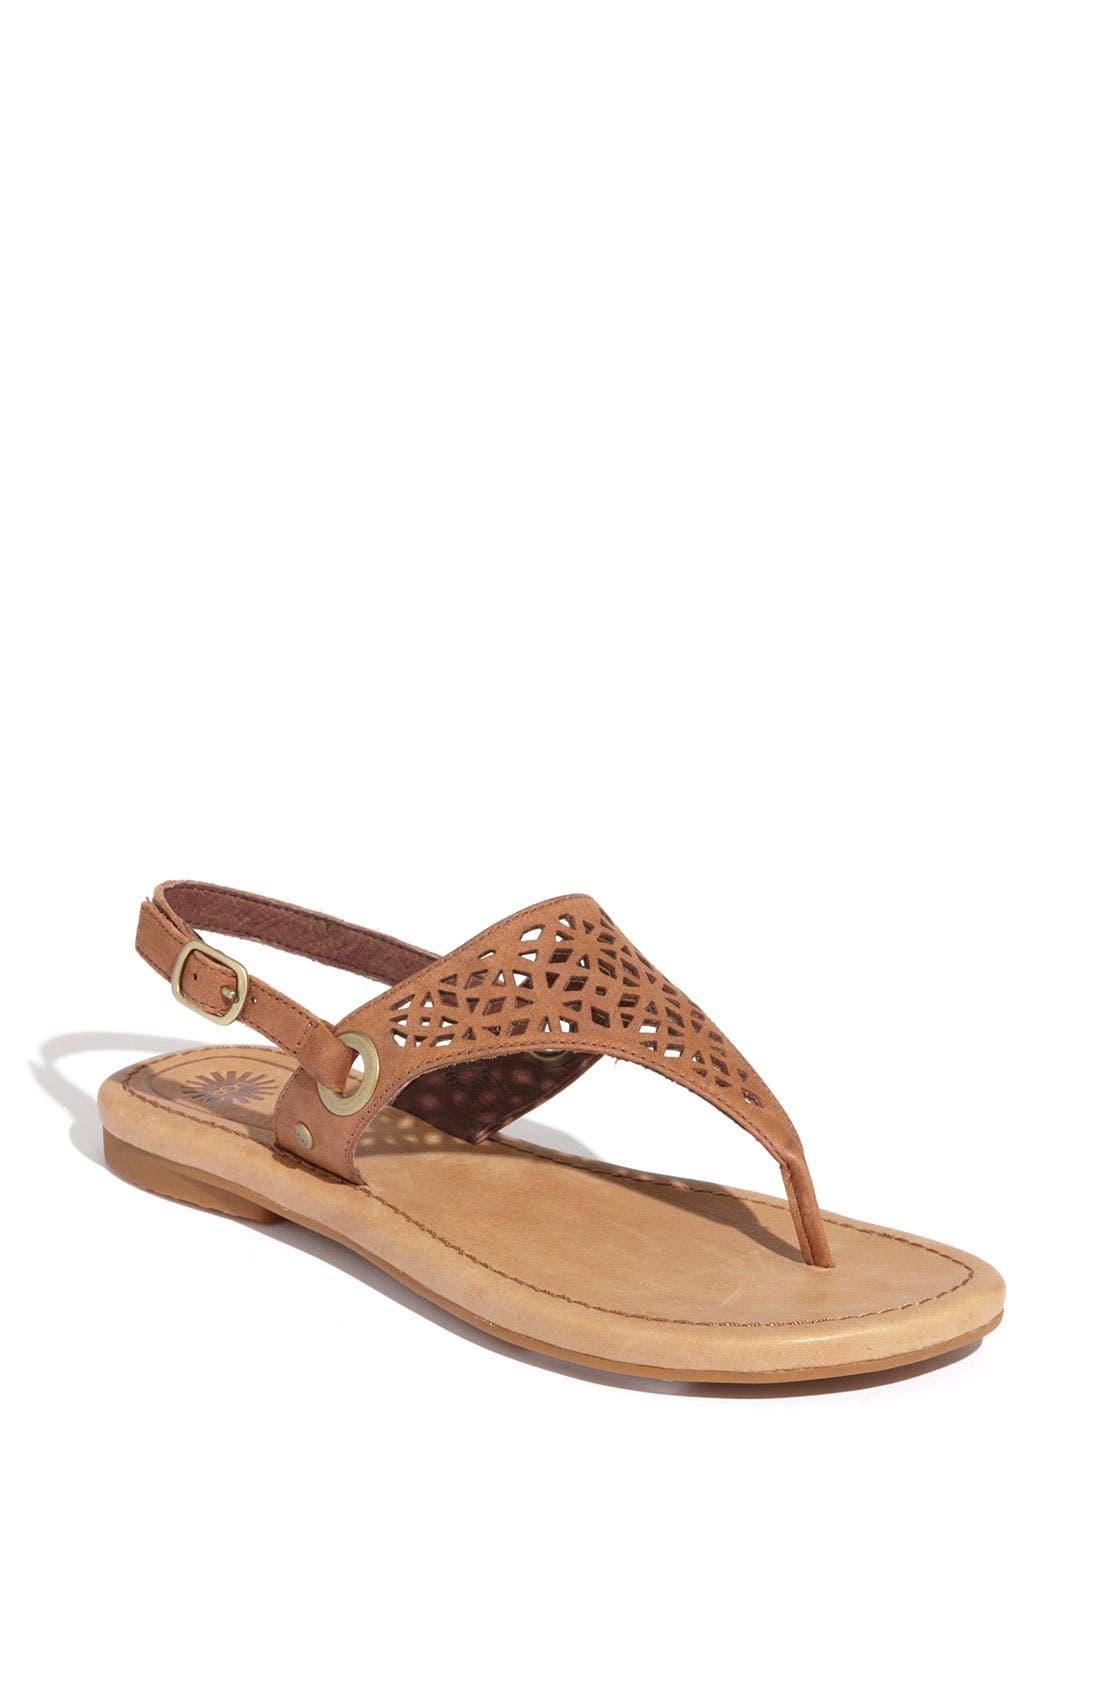 Main Image - UGG® Australia 'Vivyan' Sandal